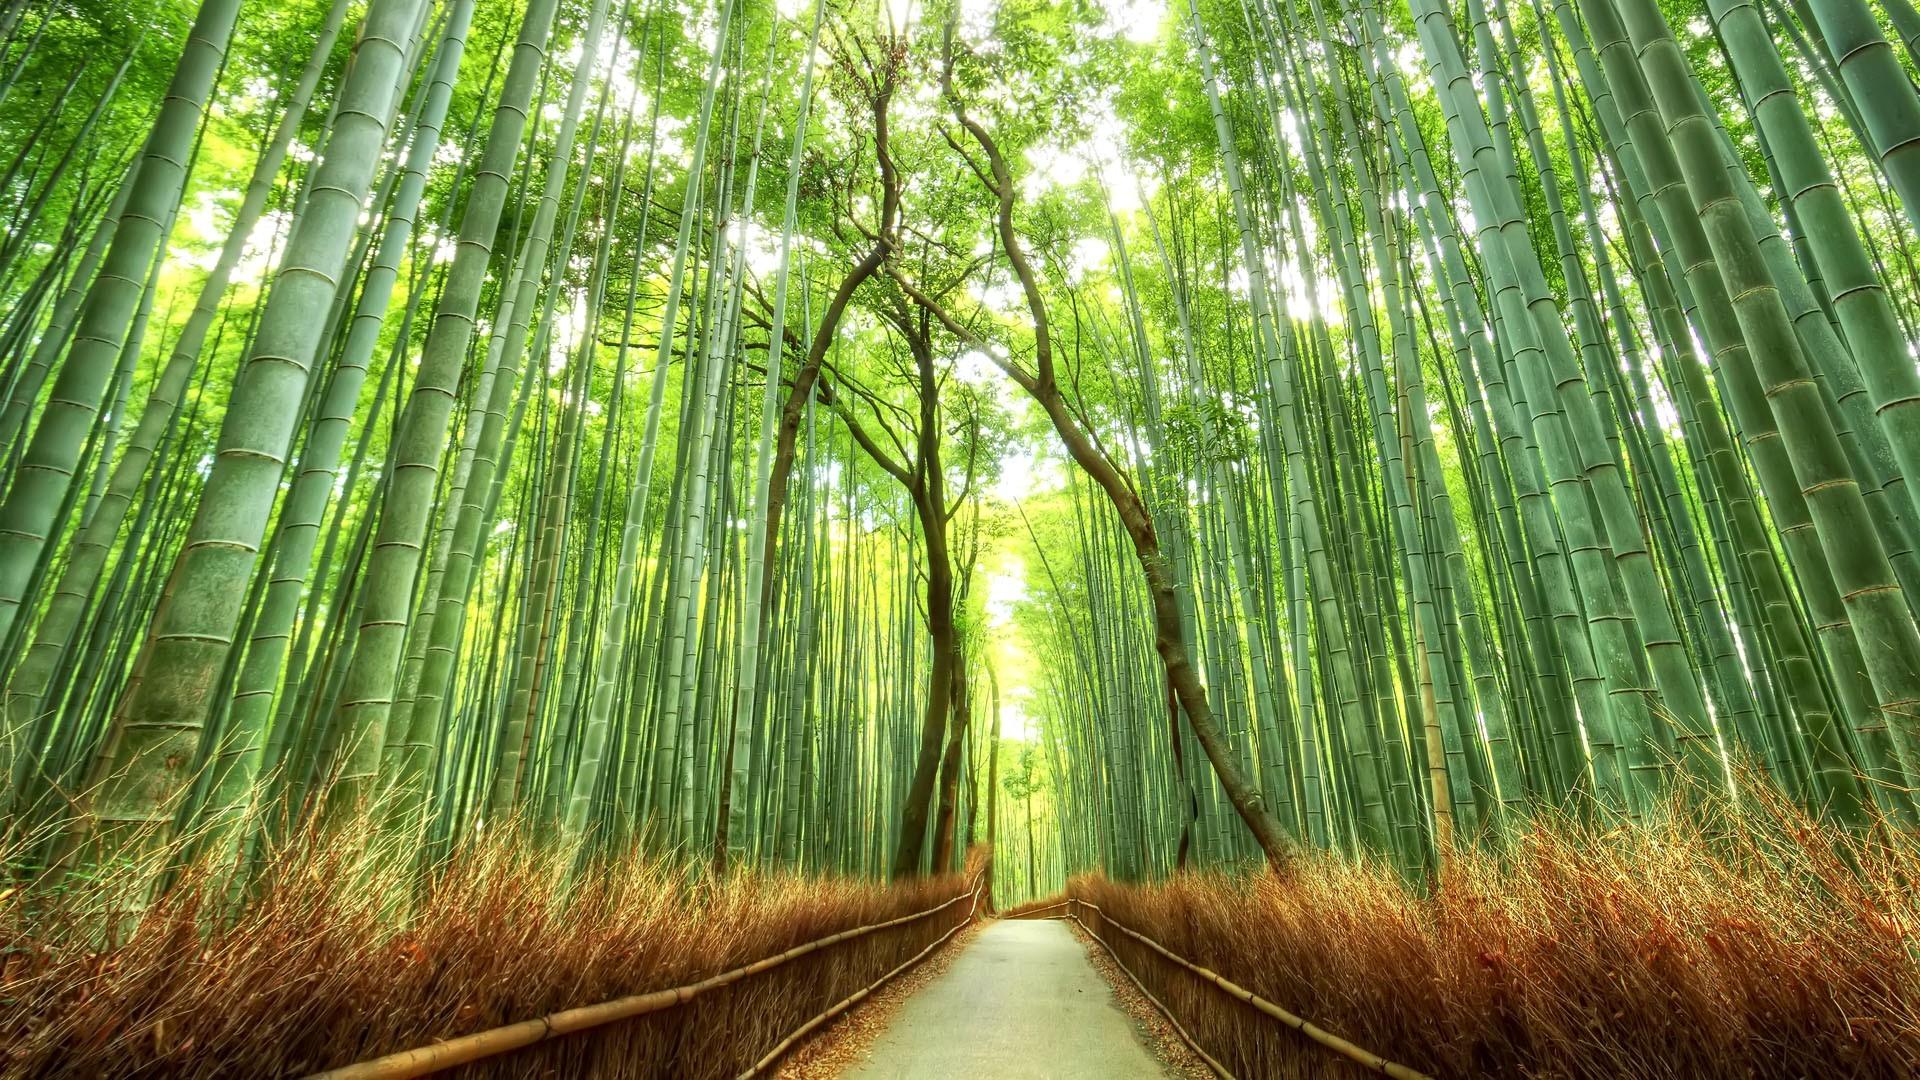 4k Laptop Wallpaper Fall Forest Japan Nature Wallpaper 183 ①